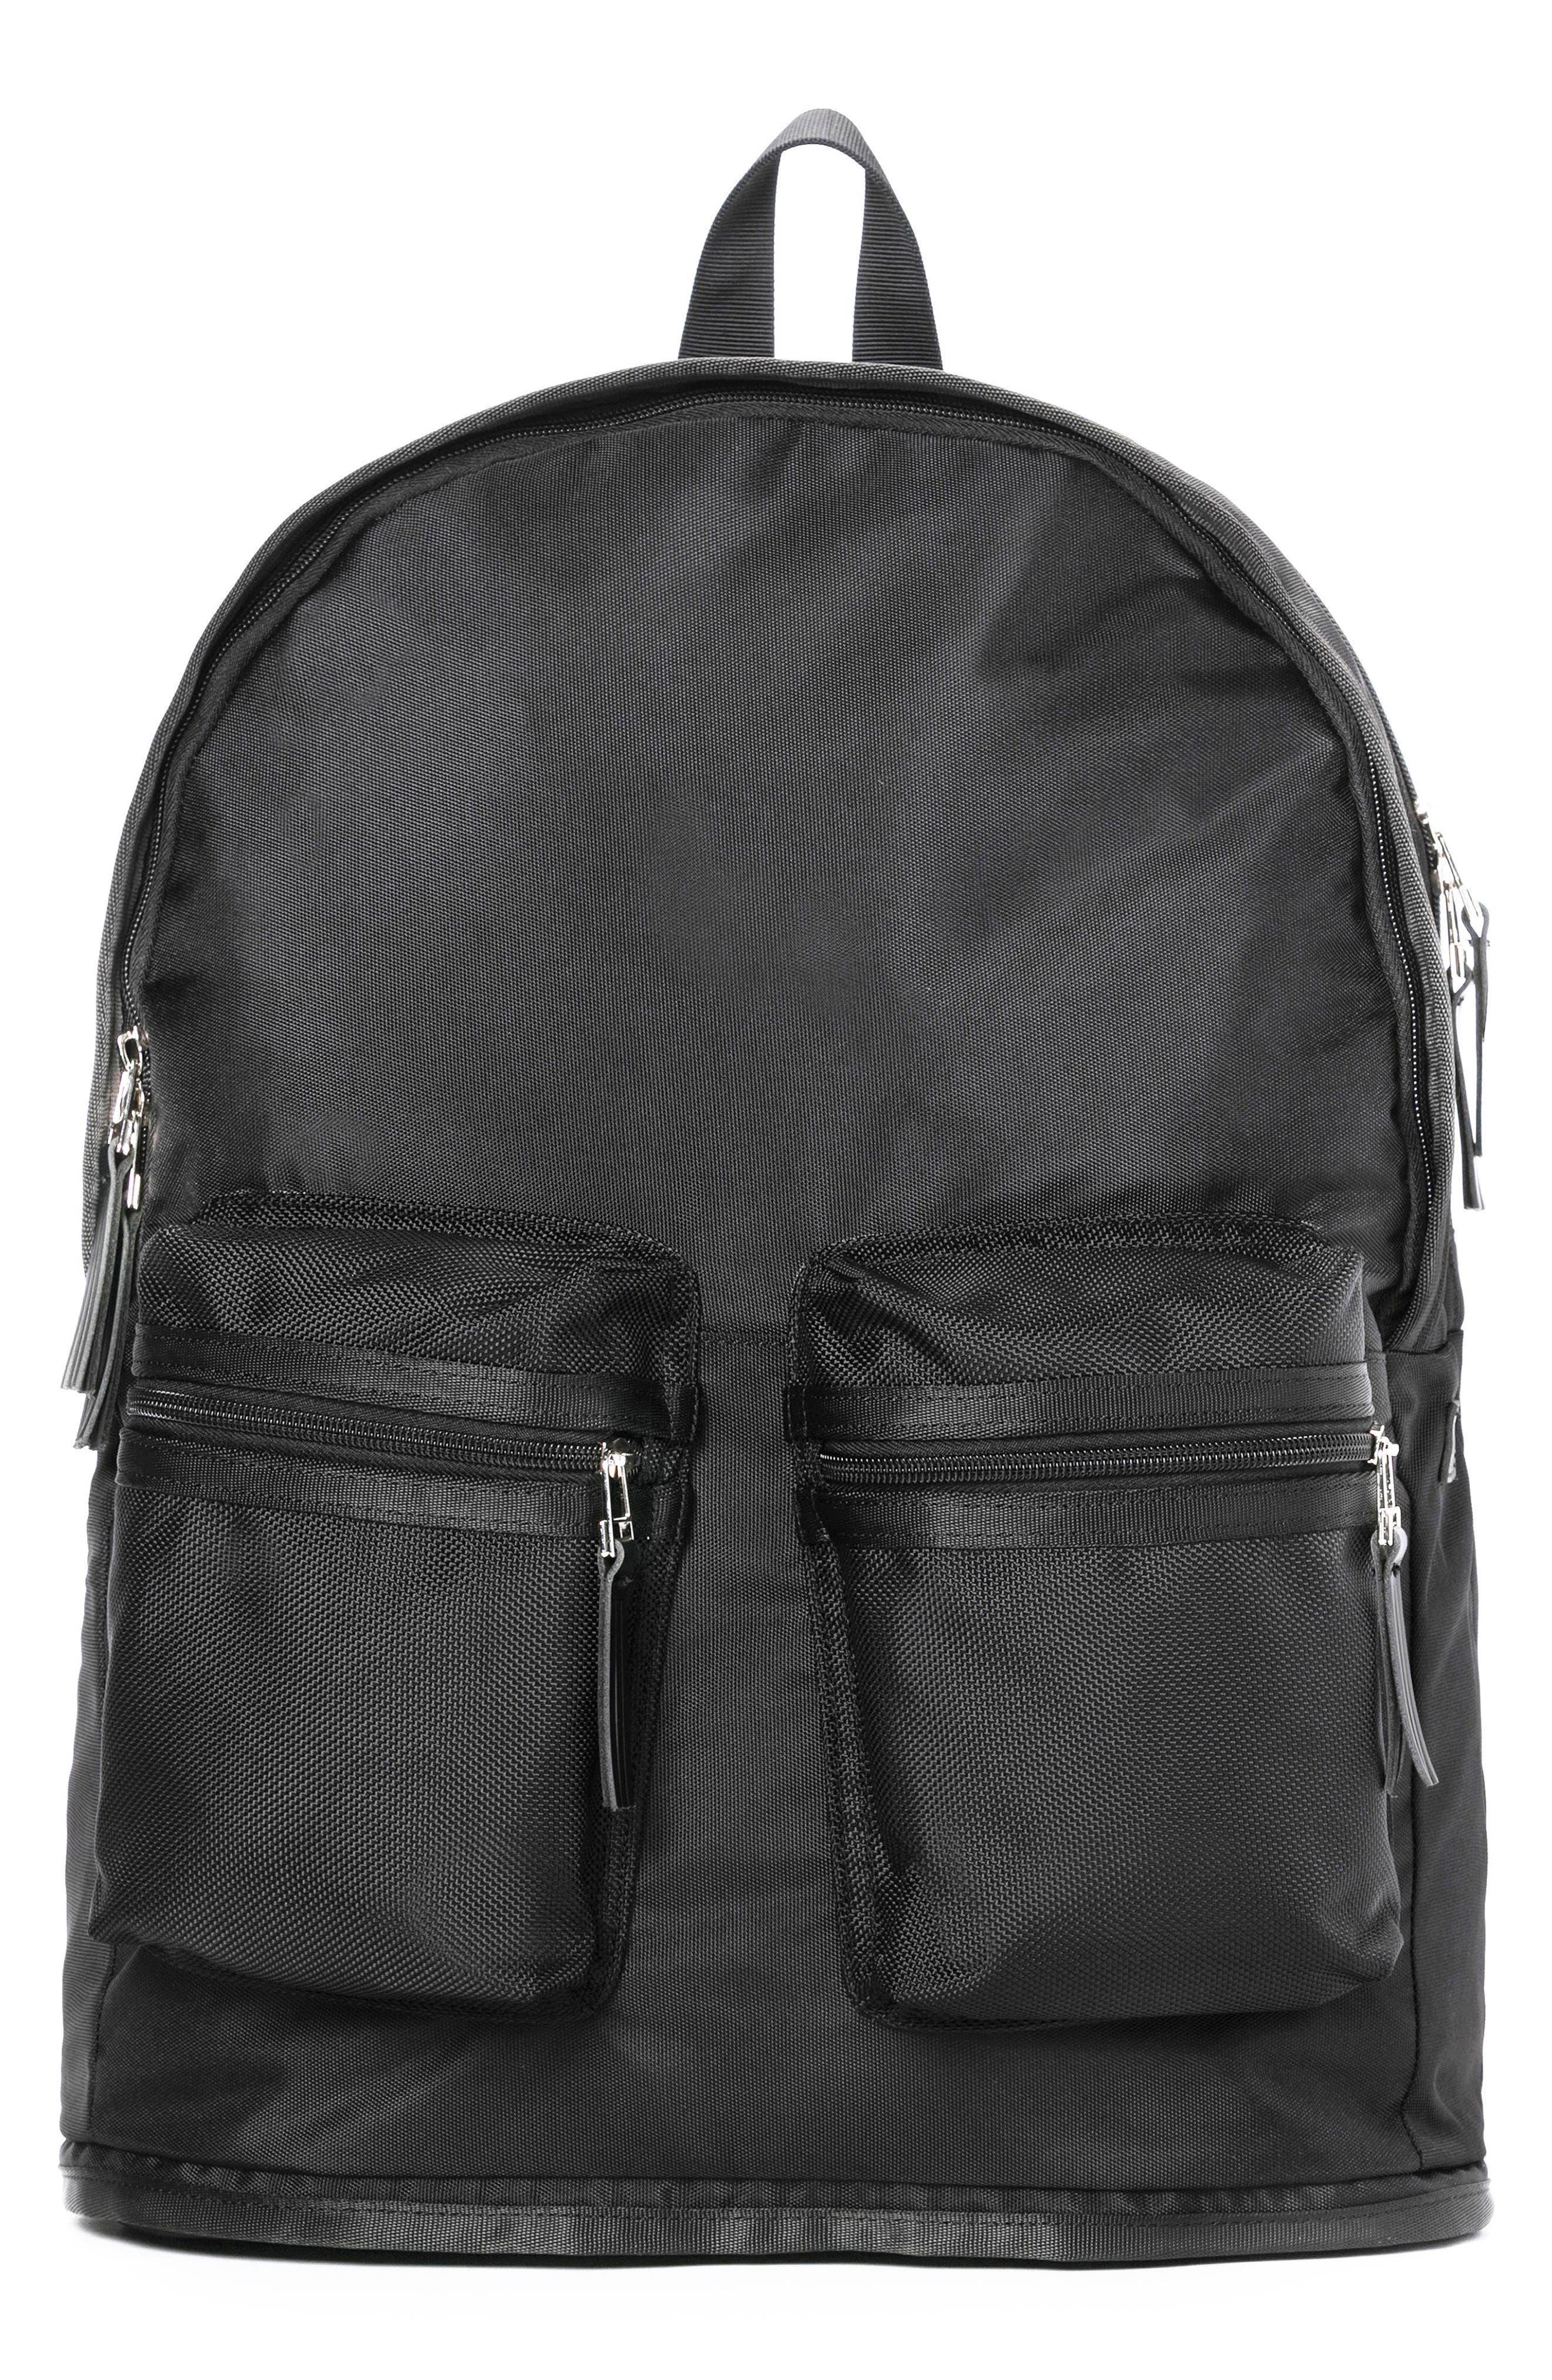 TAIKAN Spartan Backpack, Main, color, 001